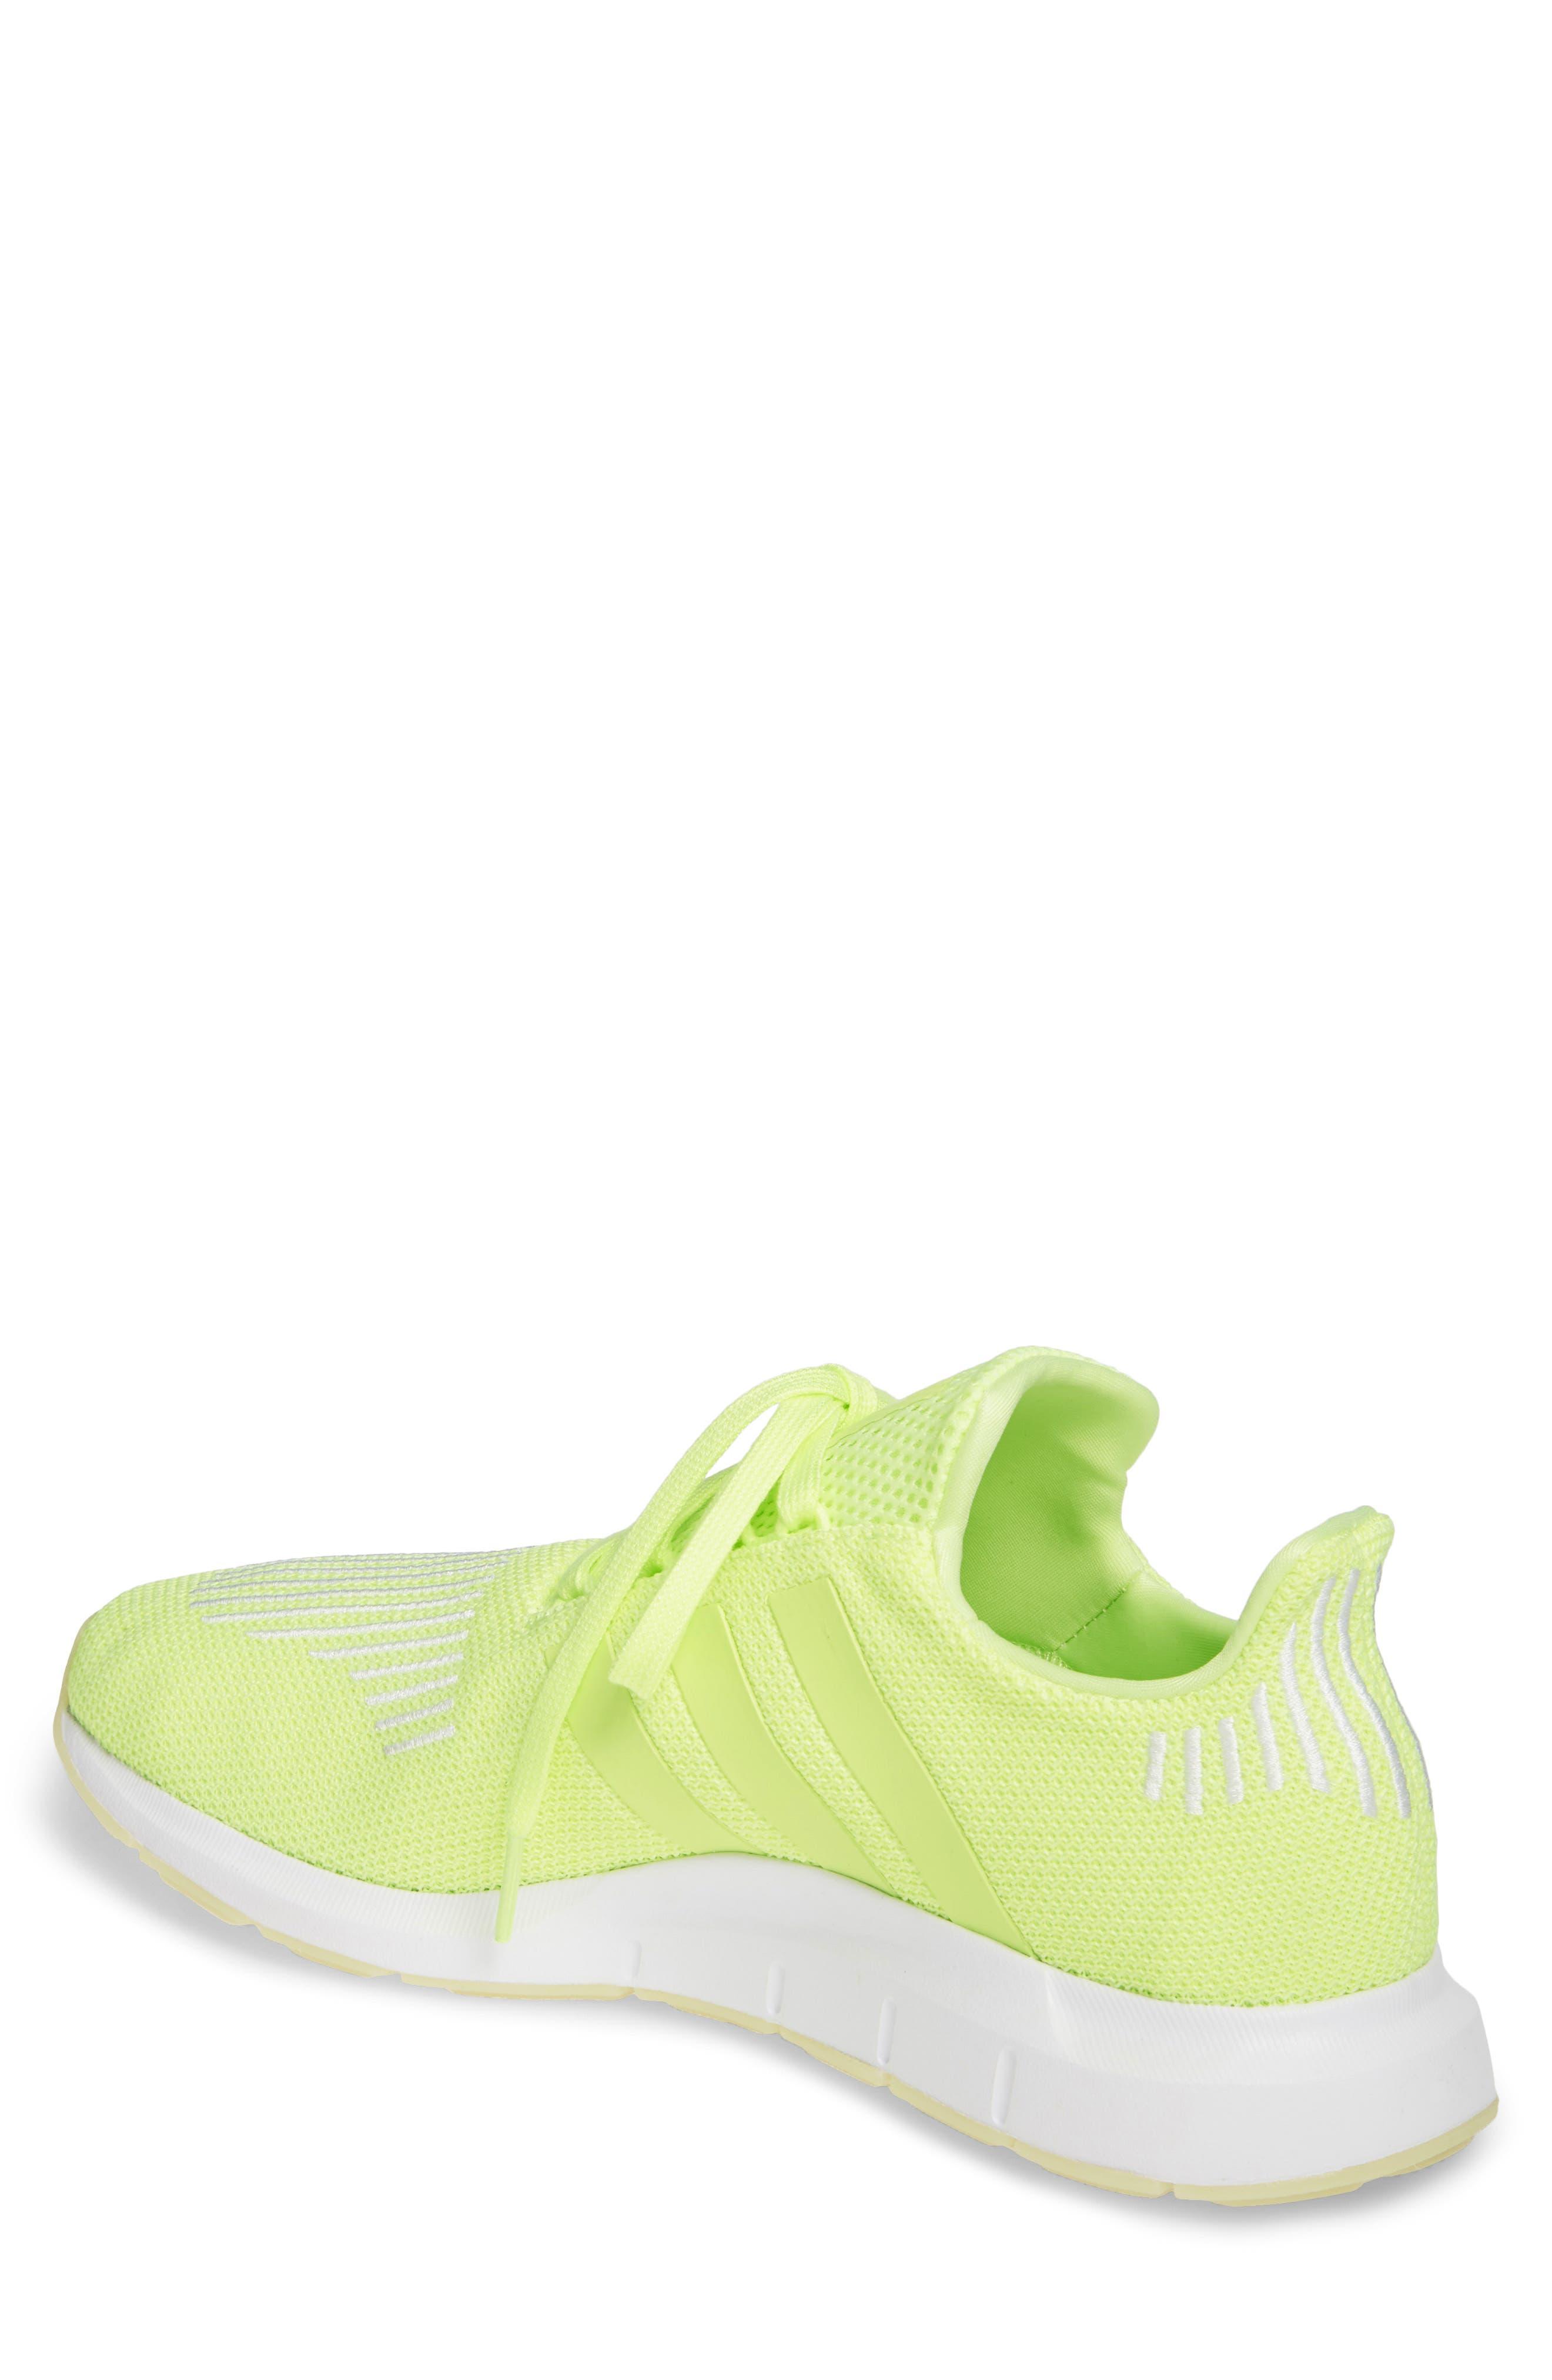 ADIDAS, Swift Run Running Shoe, Alternate thumbnail 2, color, YELLOW/ WHITE